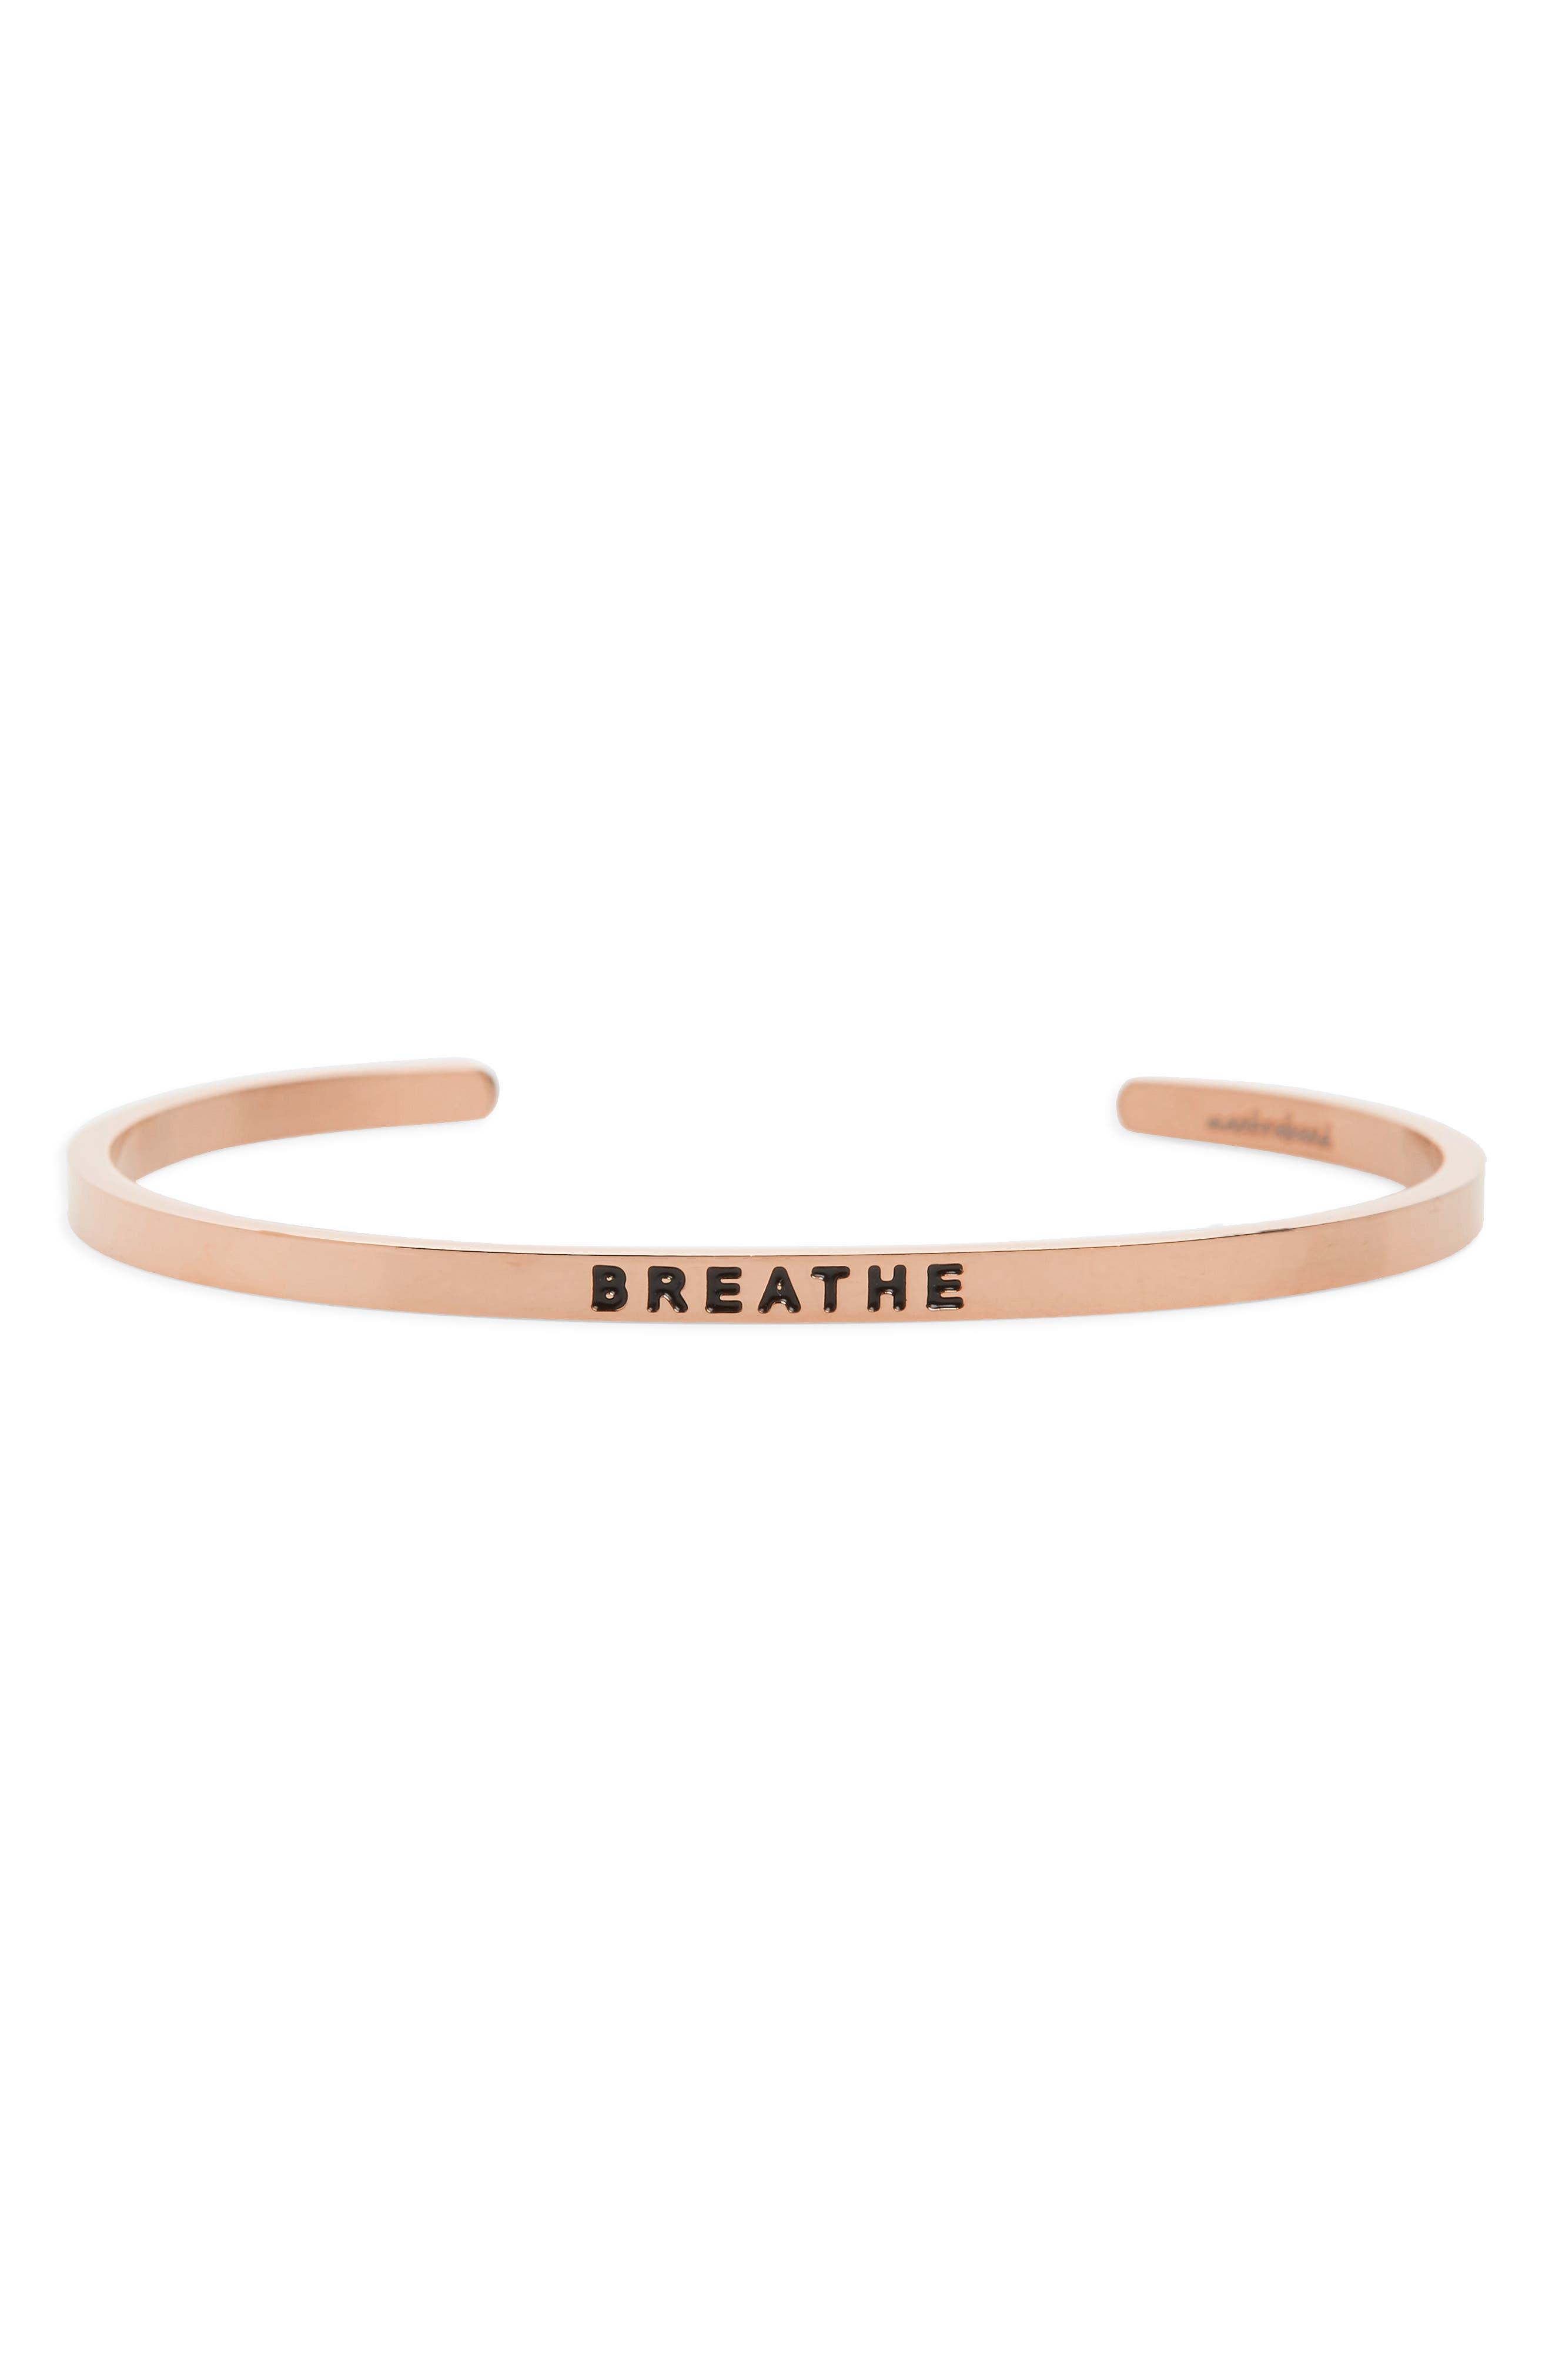 MantraBand Breathe Engraved Cuff